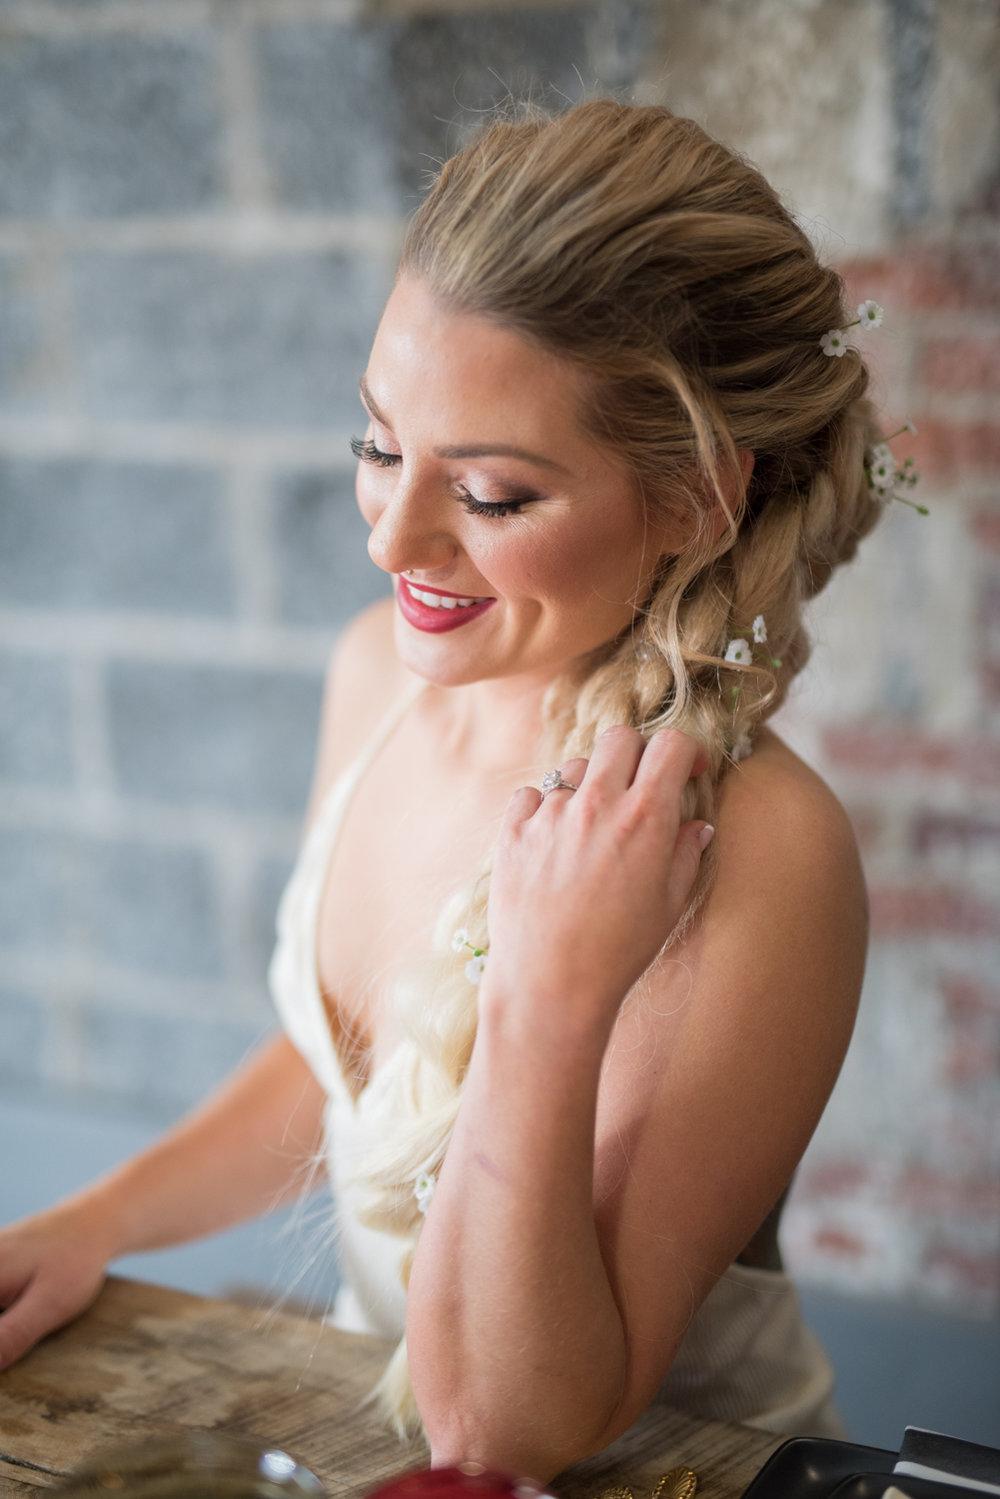 Bride Portraits- Jesse Fox  Hair Stylist- New Jersey Weddings- Olivia Christina Photography